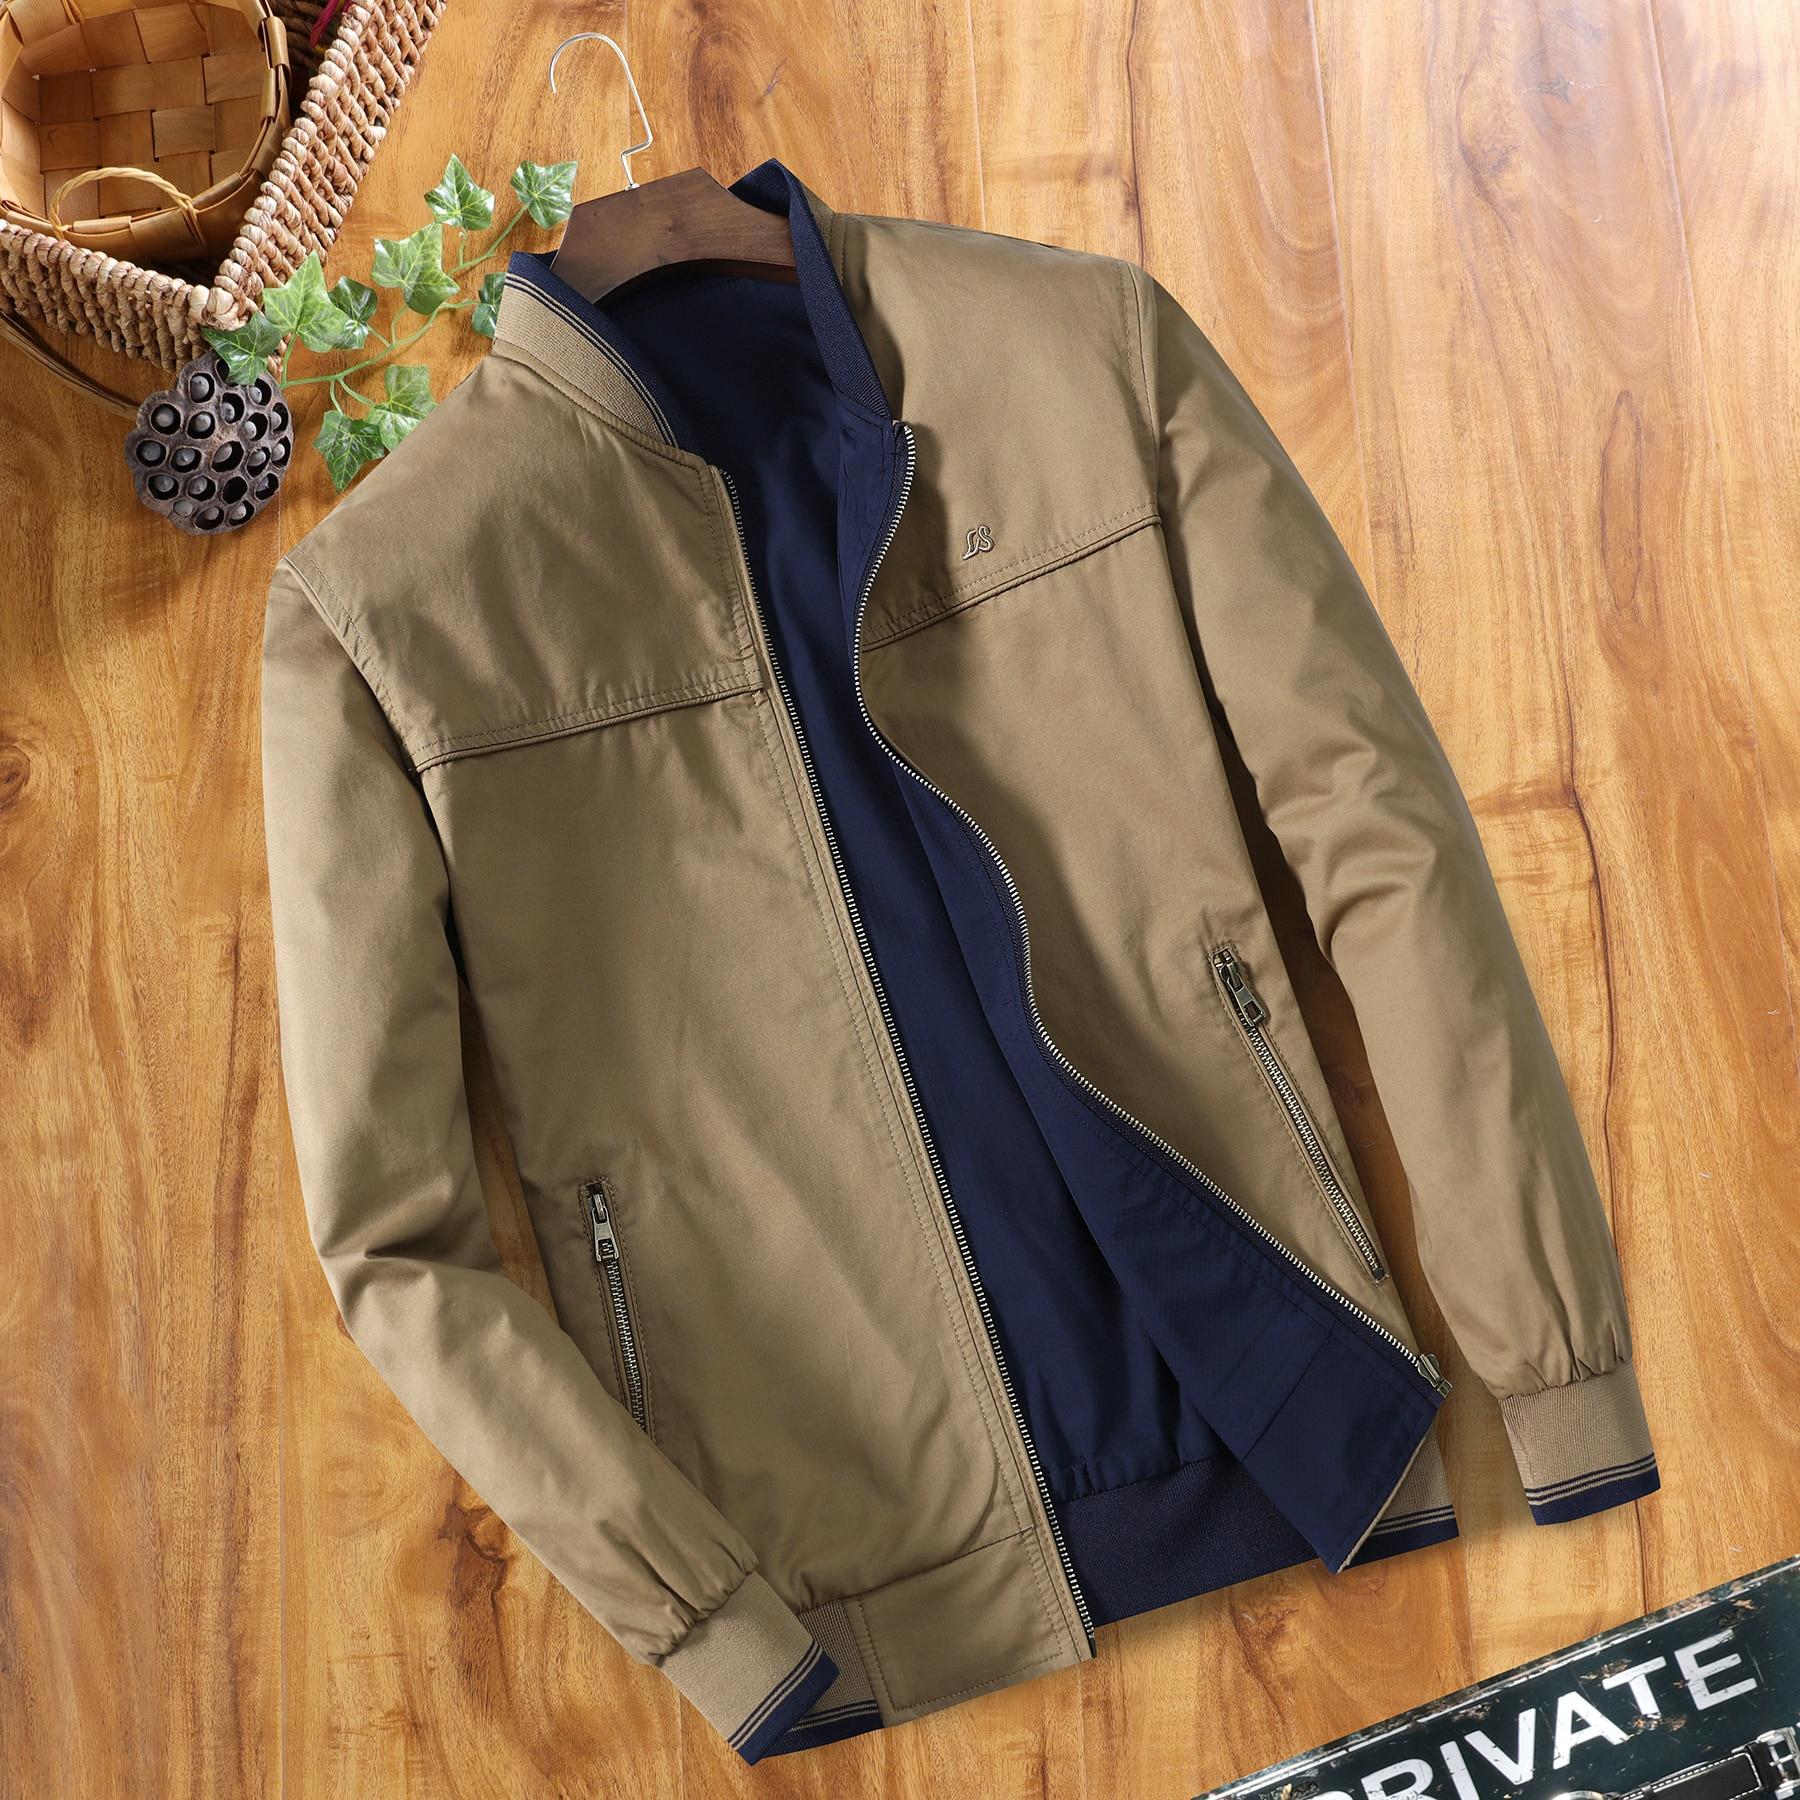 Cheap Wholesale 2019 New Autumn Winter Hot Selling Men's Fashion  Casual  Work Wear Nice Jacket MC80